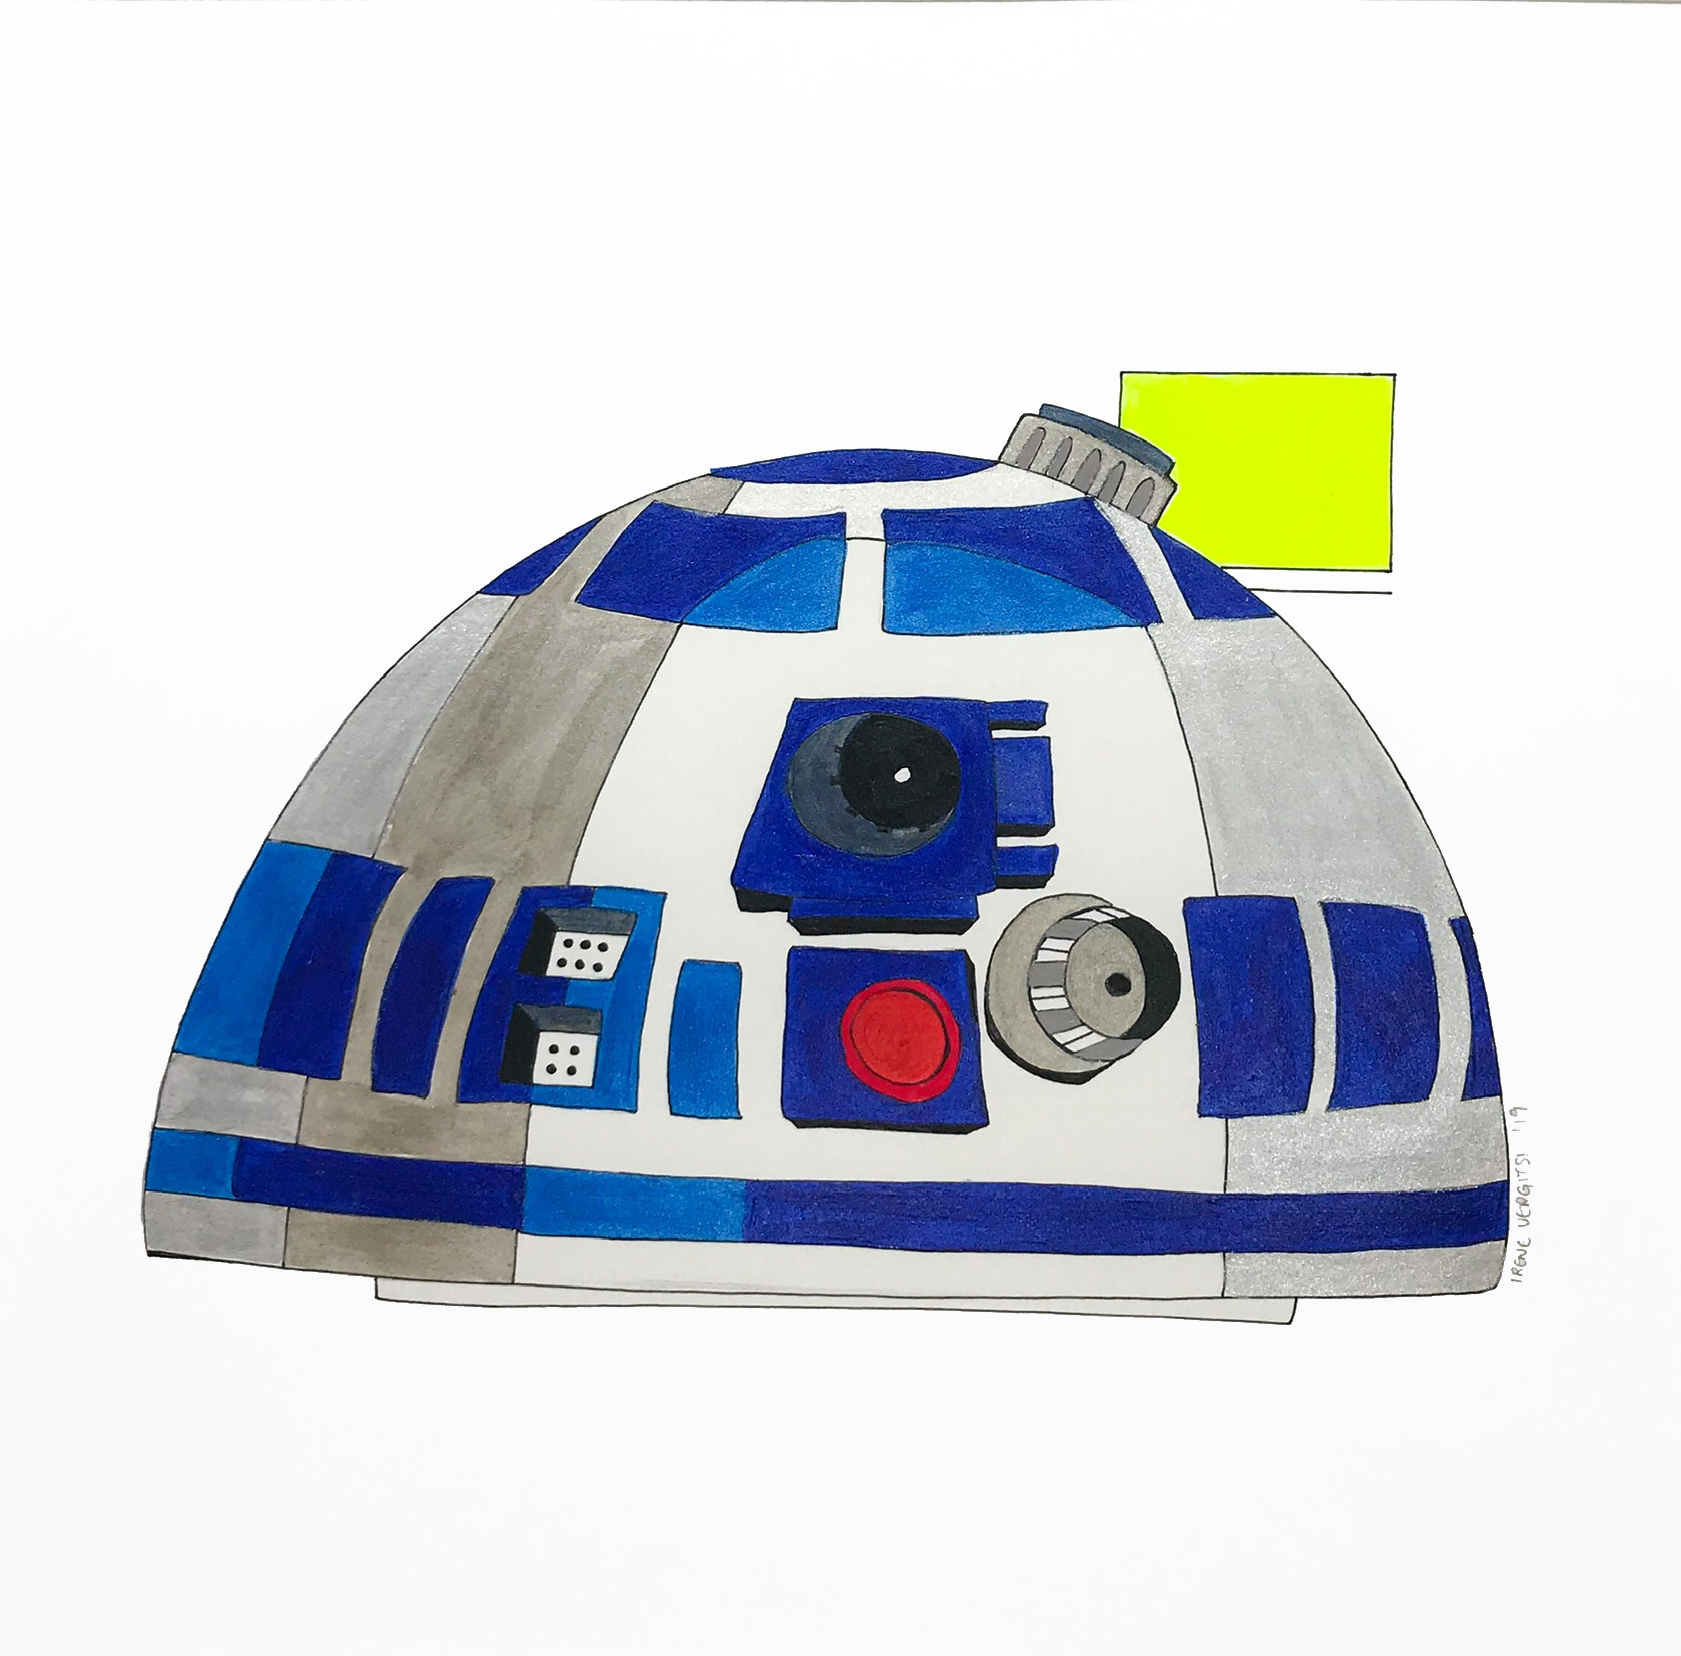 (droid) 1 1